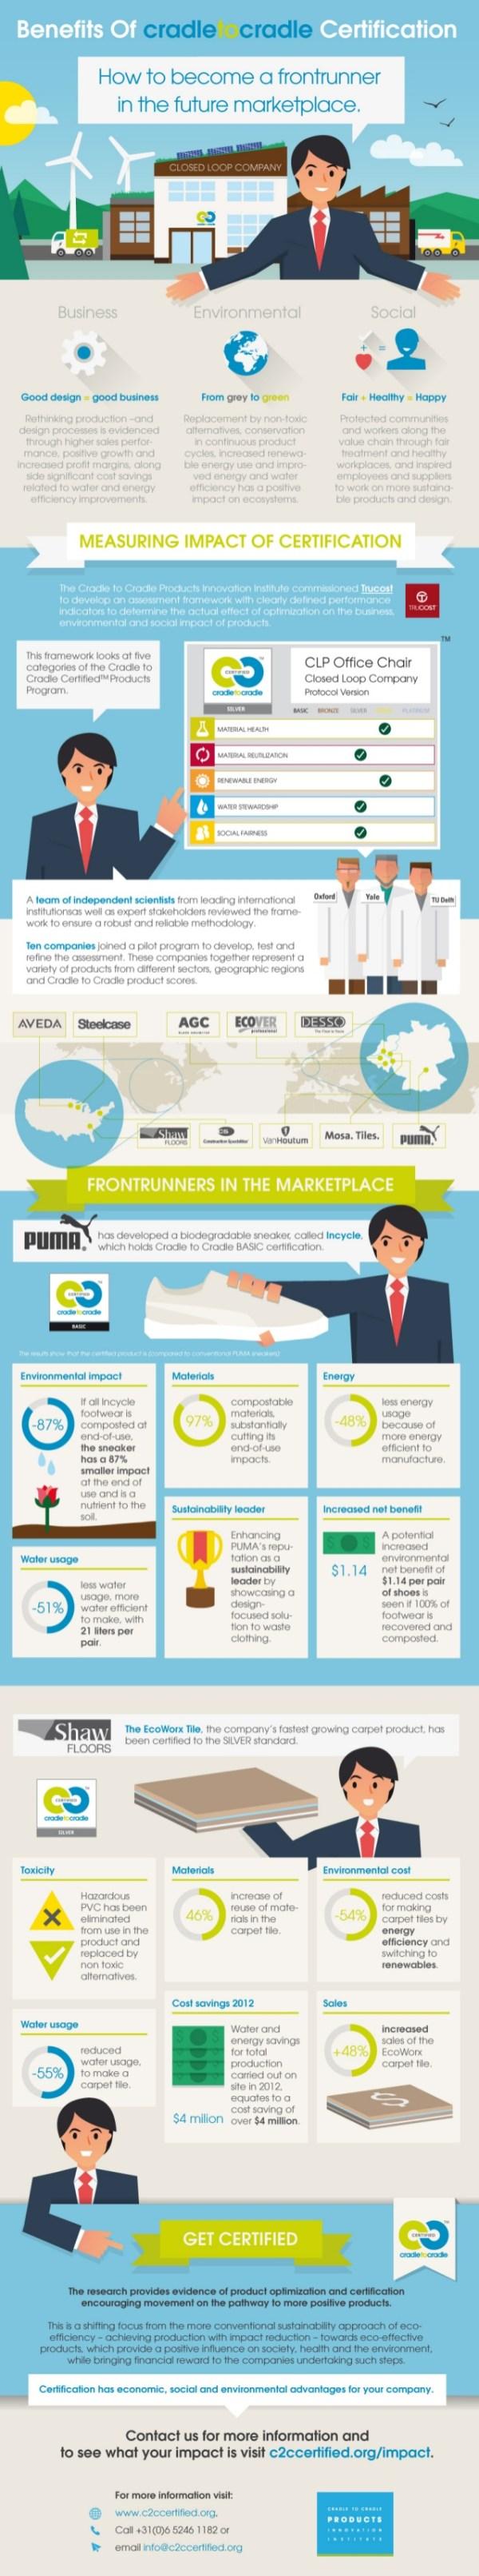 Cradle-2-Cradle-infographic